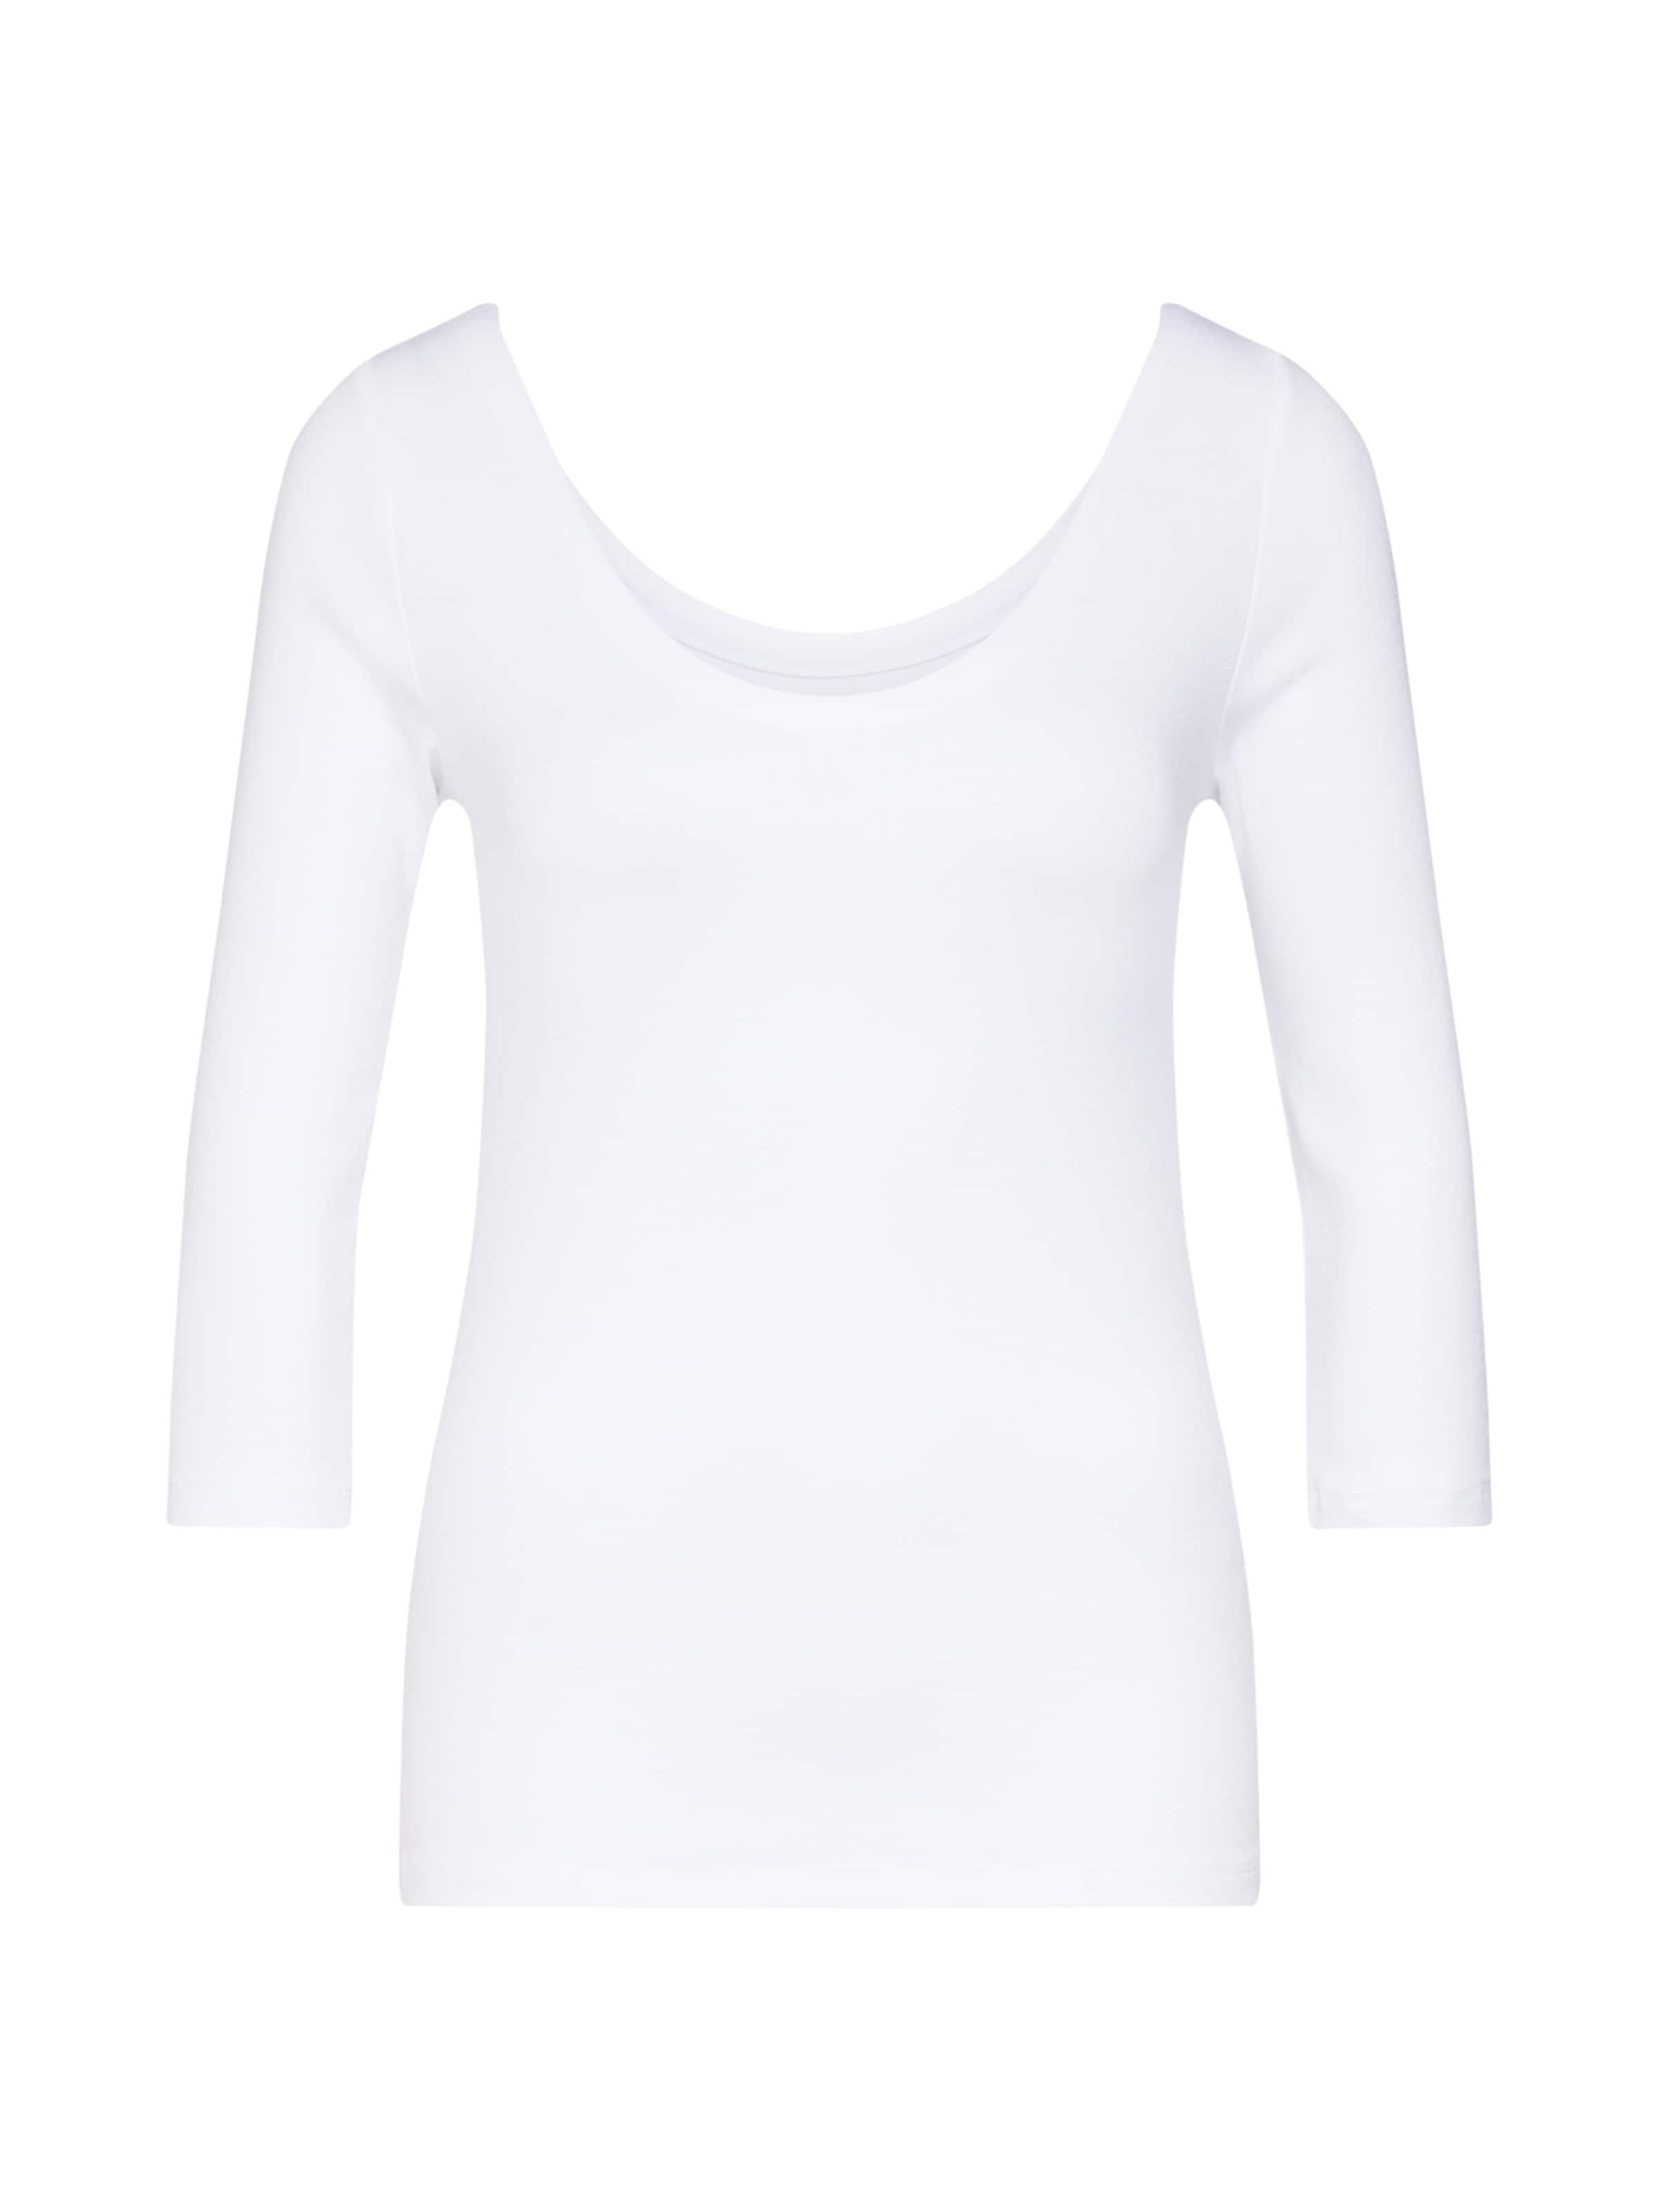 Ballet Bk' Noir 'ss En Gap T shirt Mod W2E9HDIYe